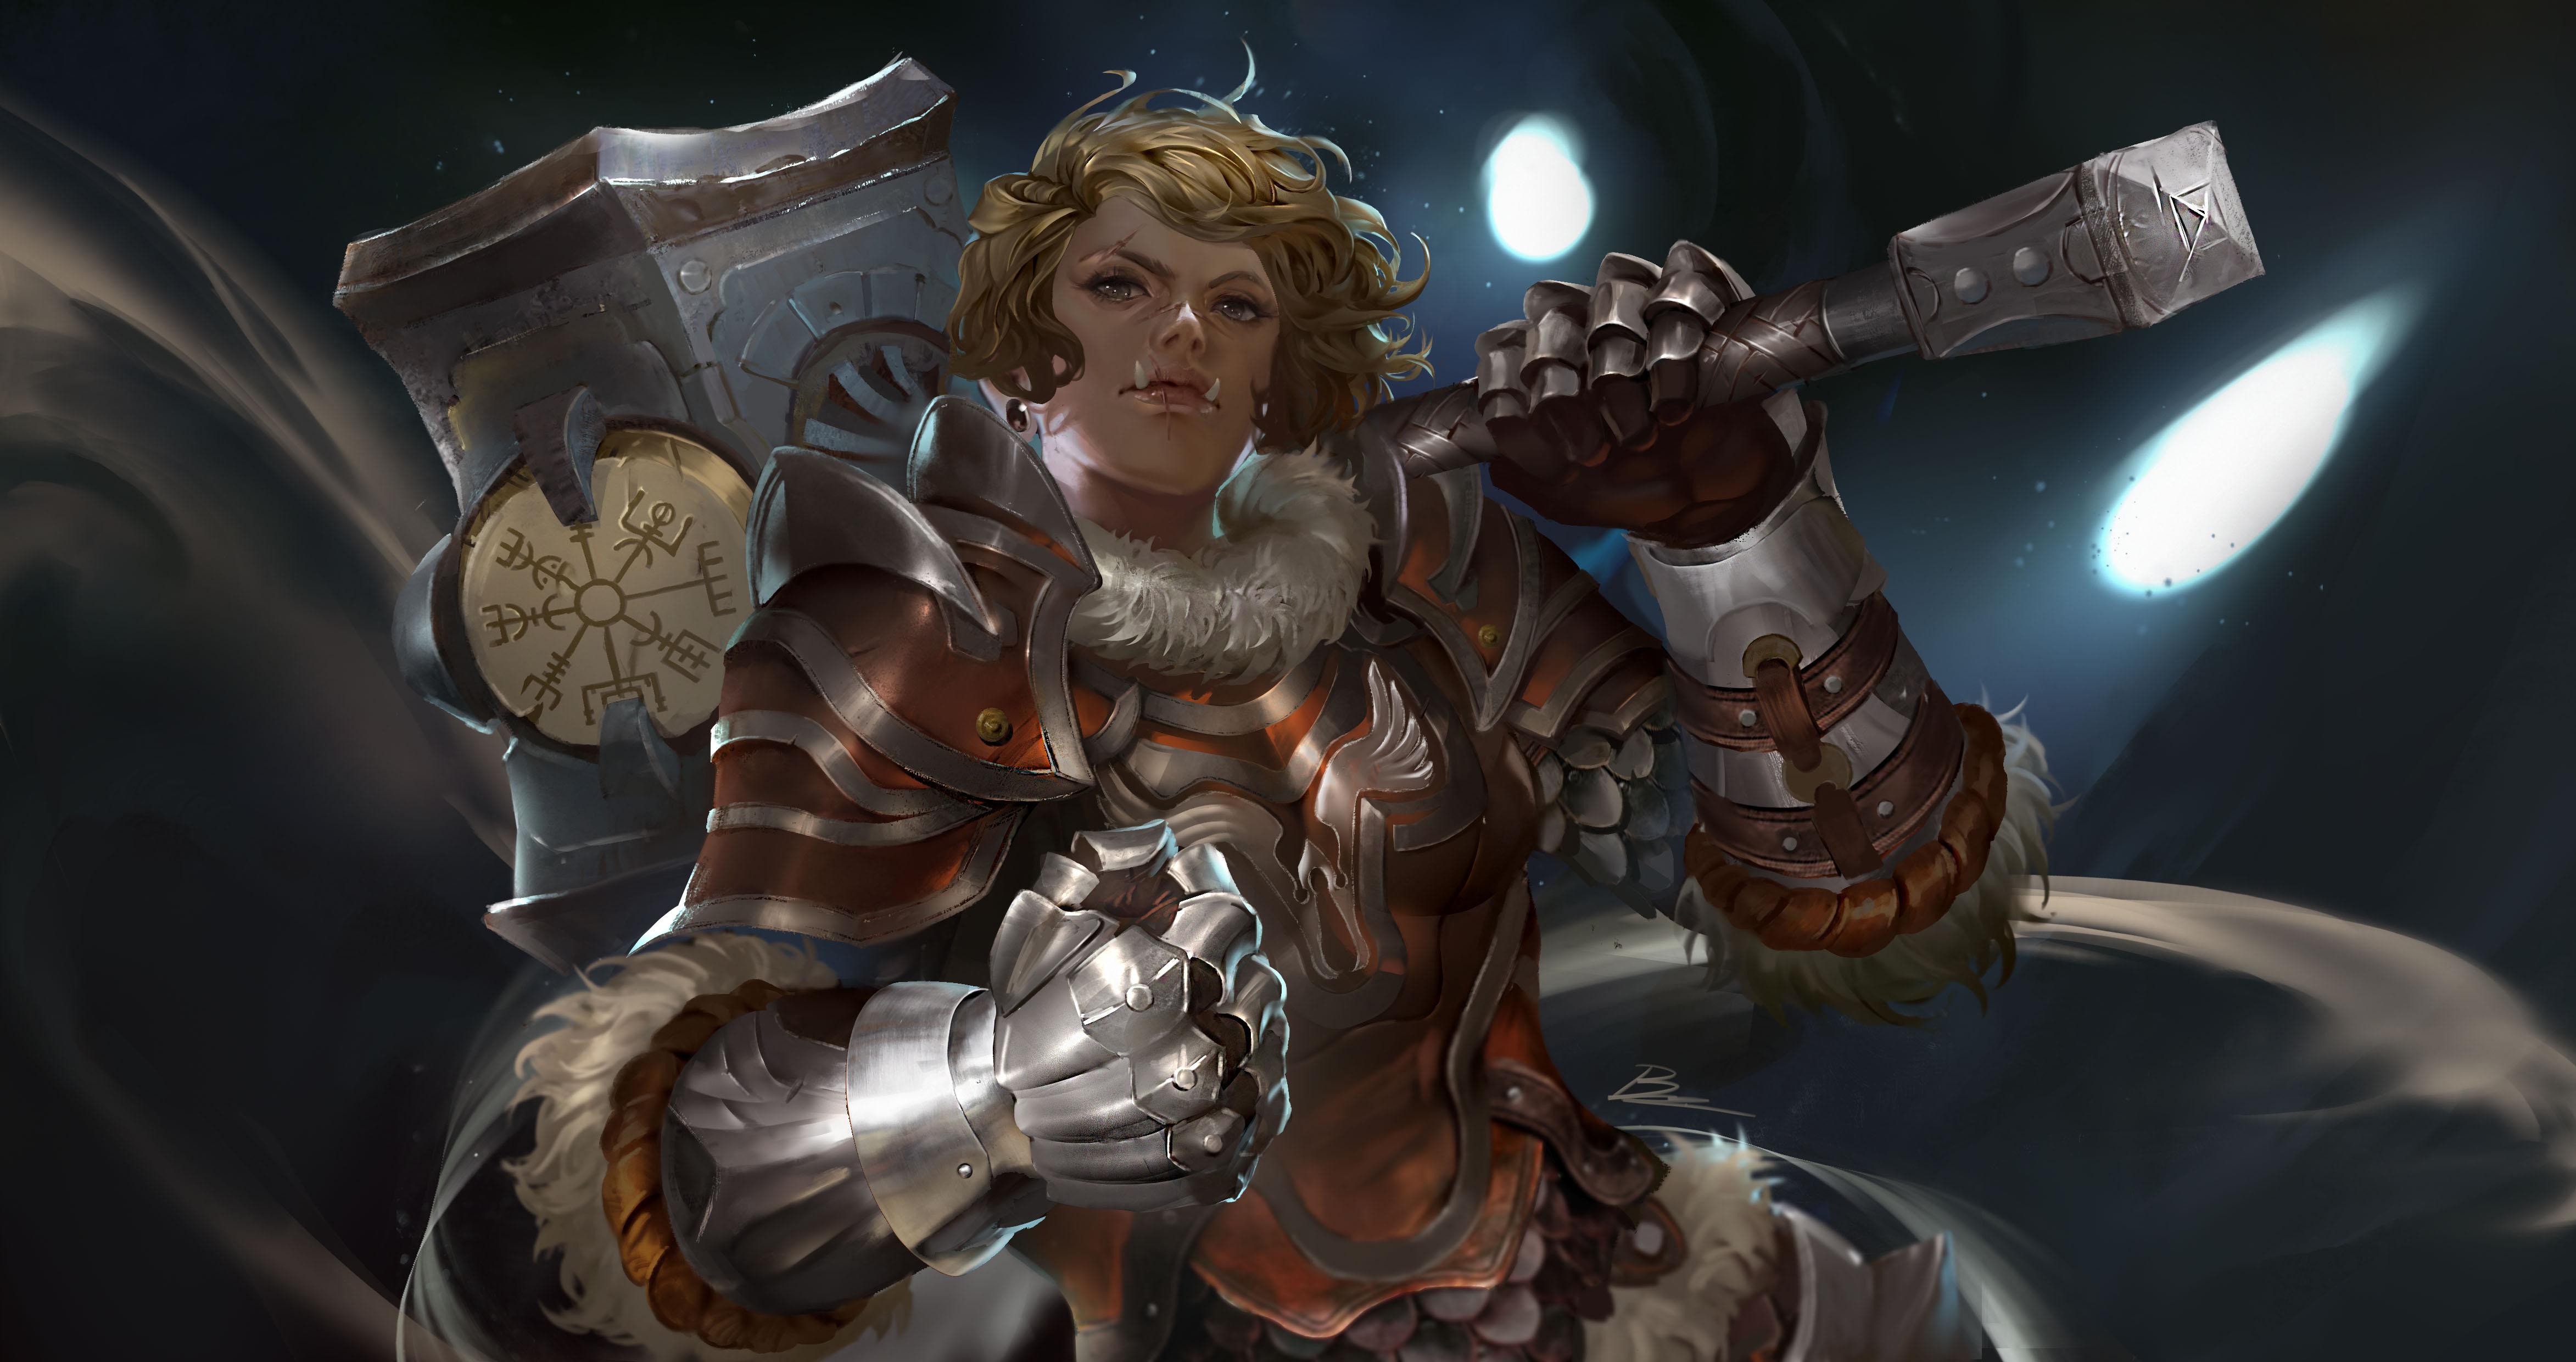 Woman Warrior Girl Blonde Hammer Armor Short Hair 4691x2480